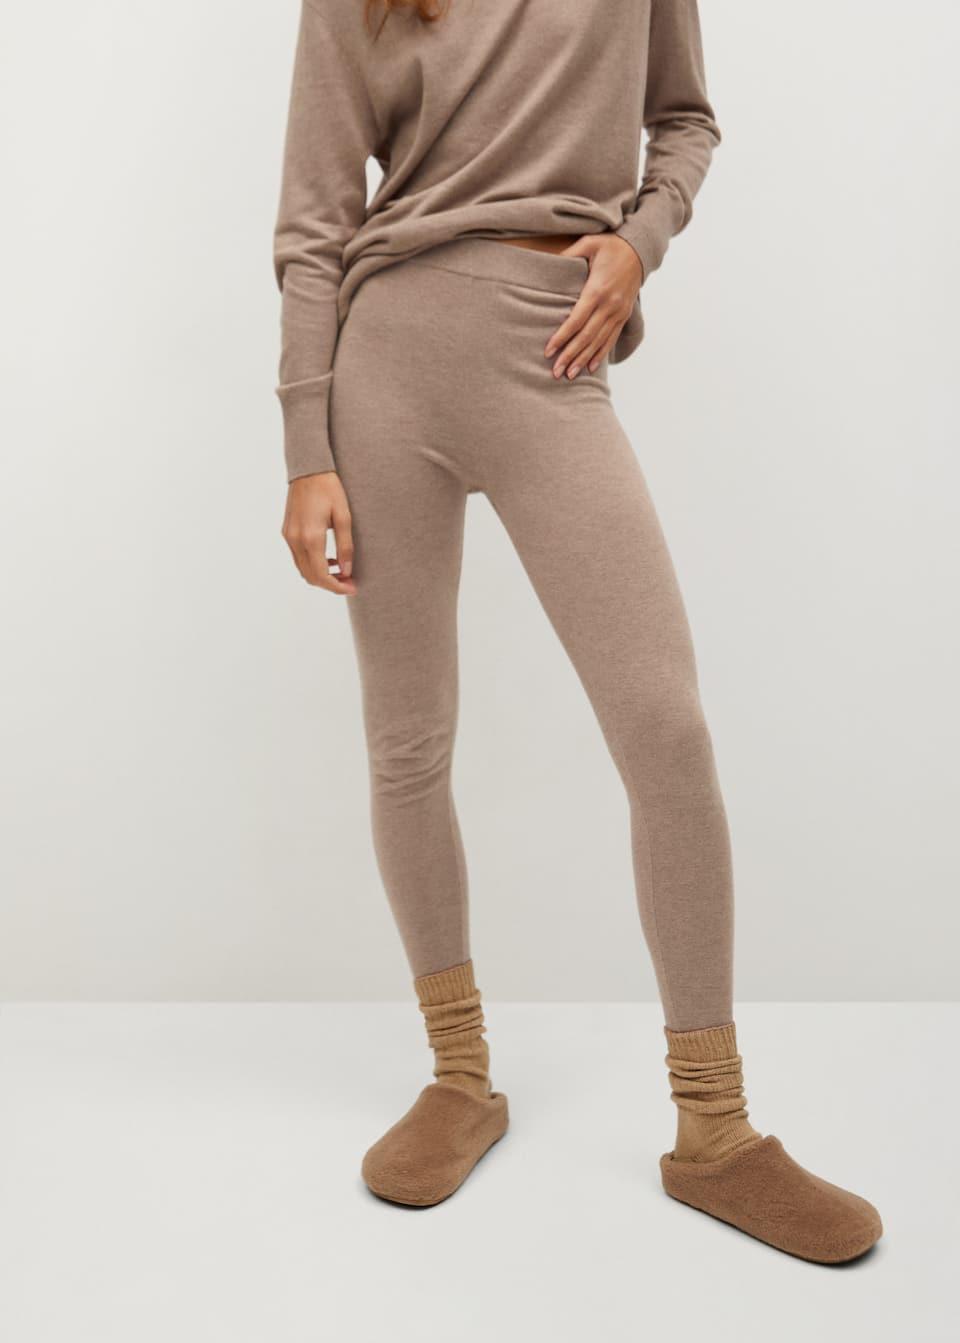 Pantalon Jogger Punto Mujer Mango Espana